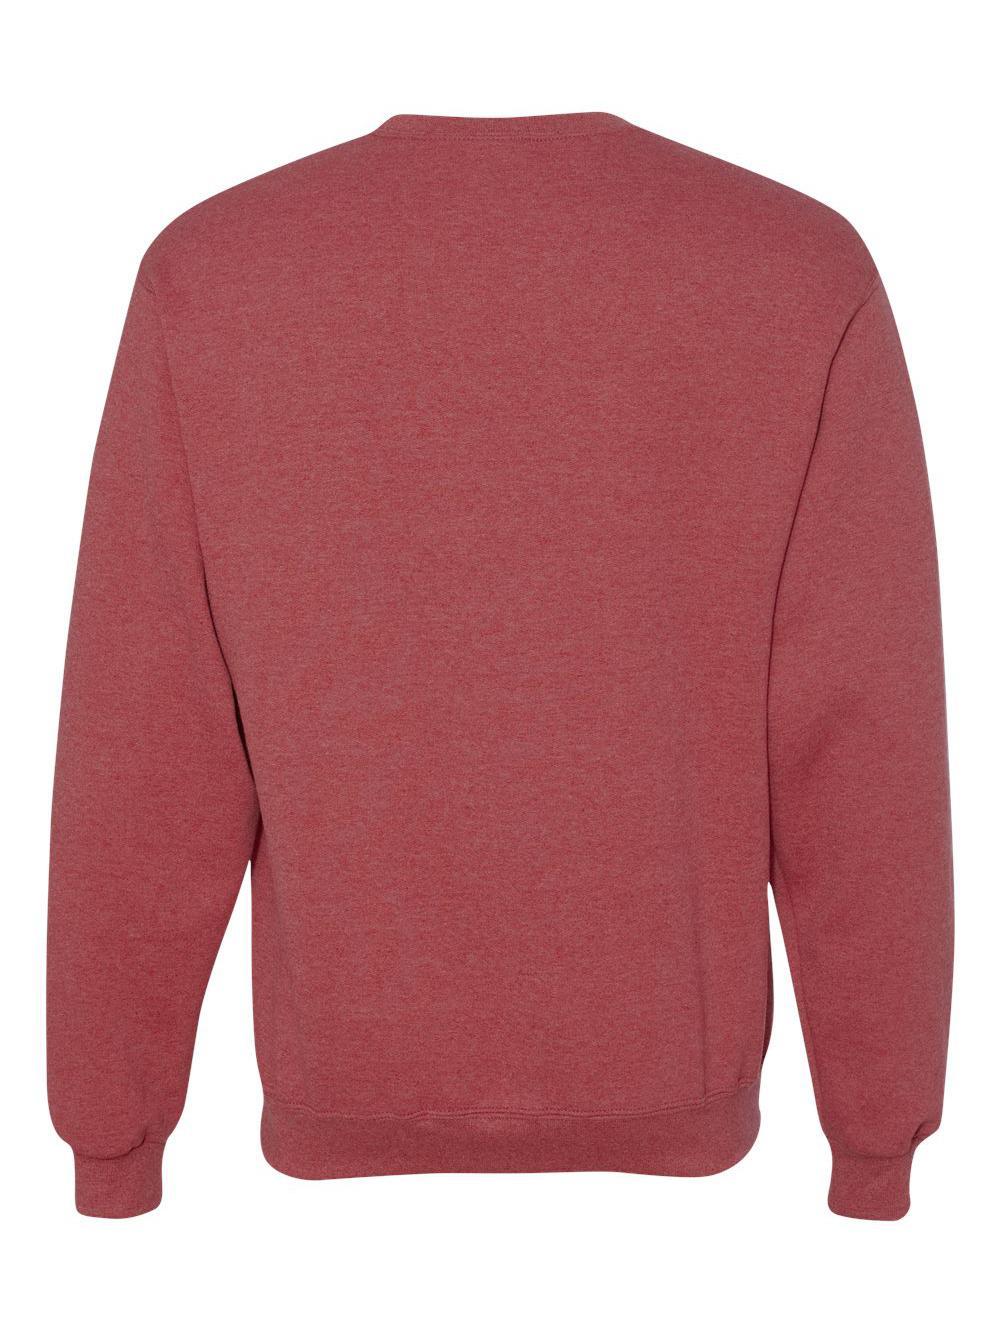 Jerzees-NuBlend-Crewneck-Sweatshirt-562MR thumbnail 100